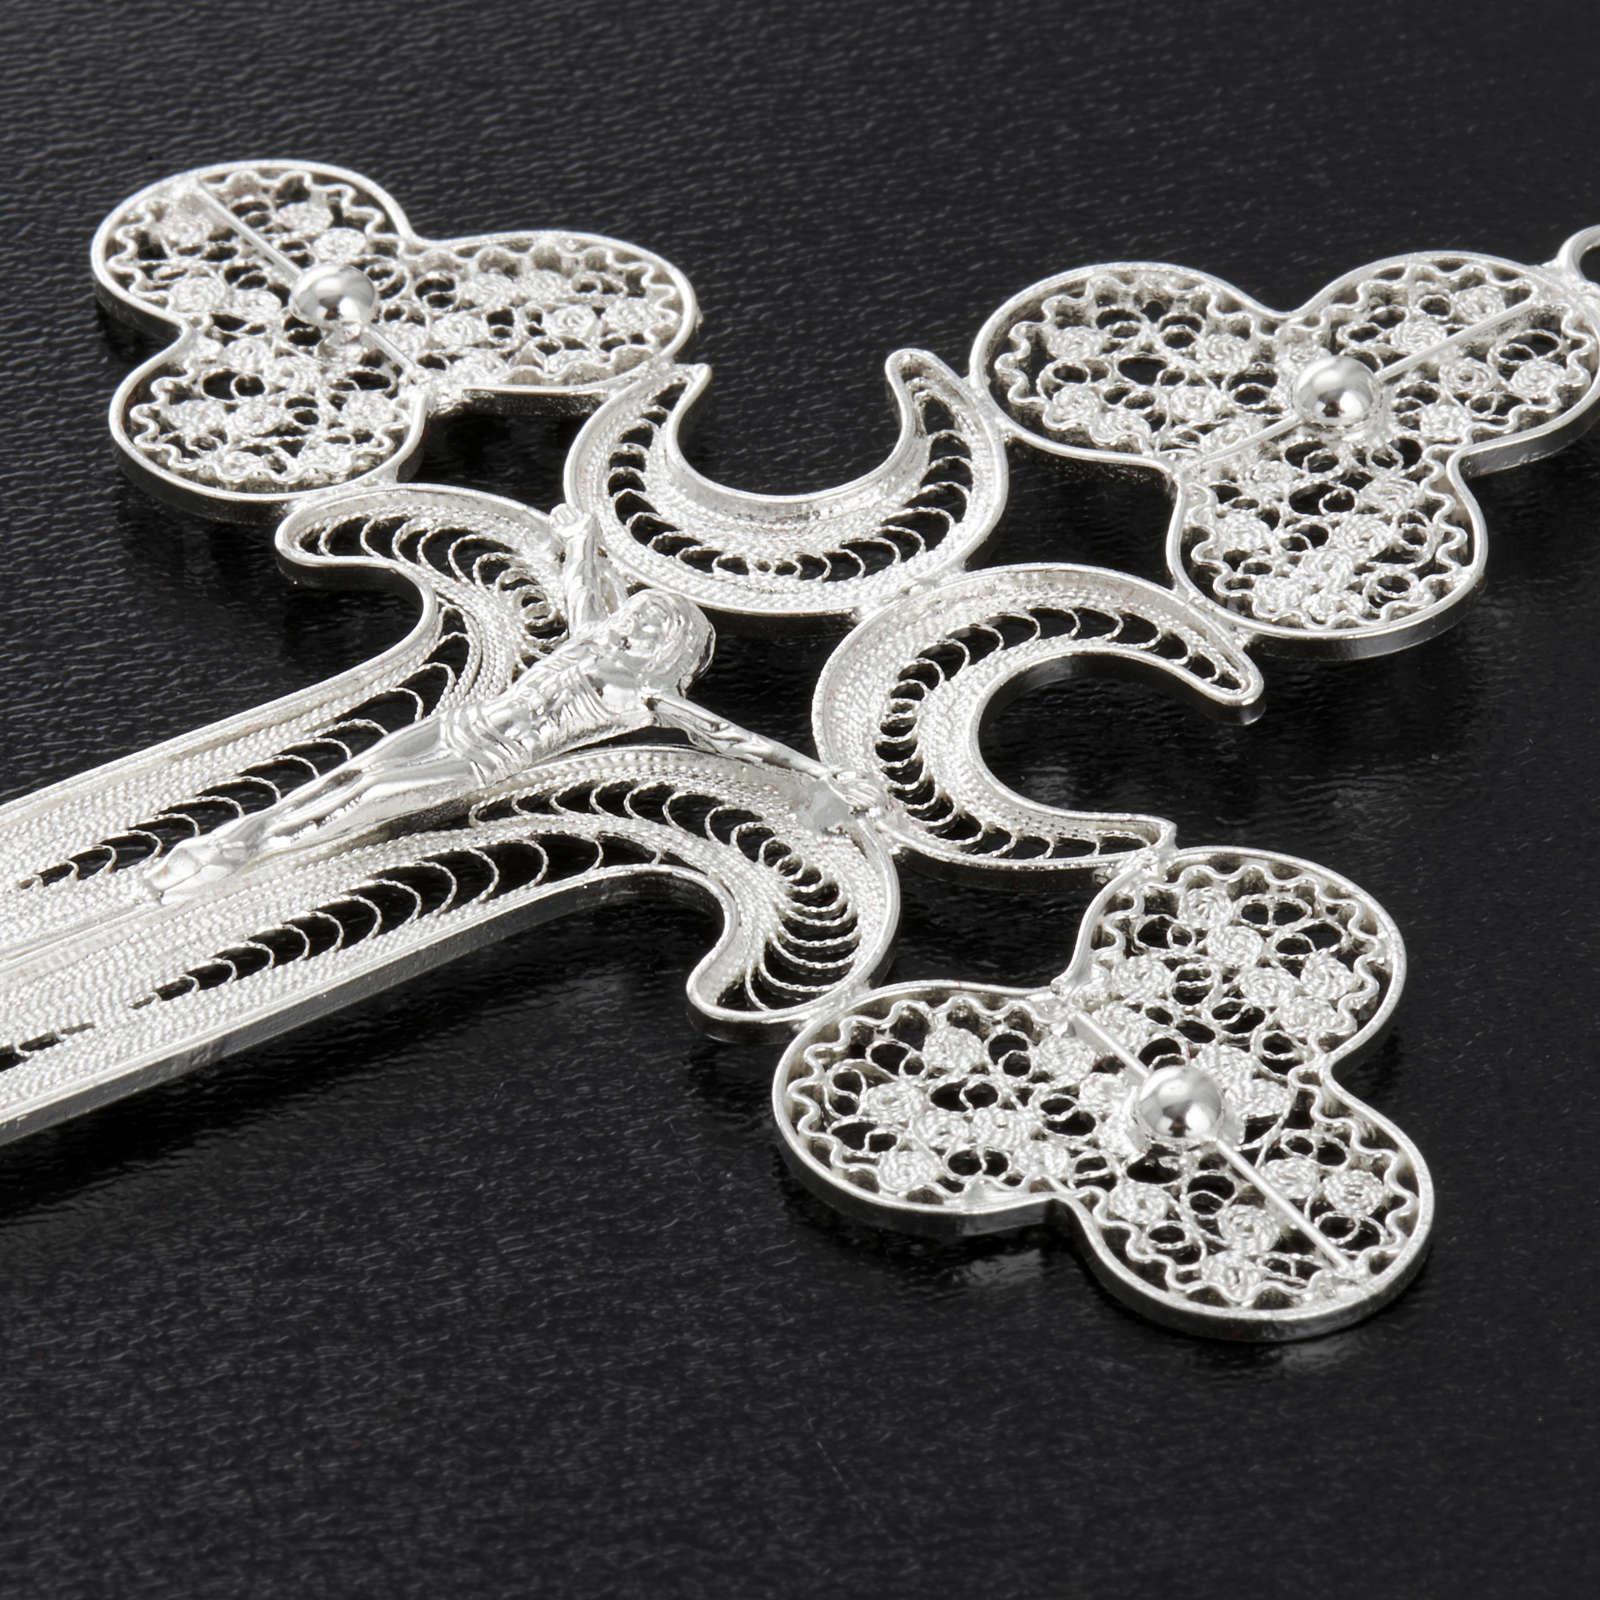 Pingente cruz filigrana prata 800 12,7 g 4